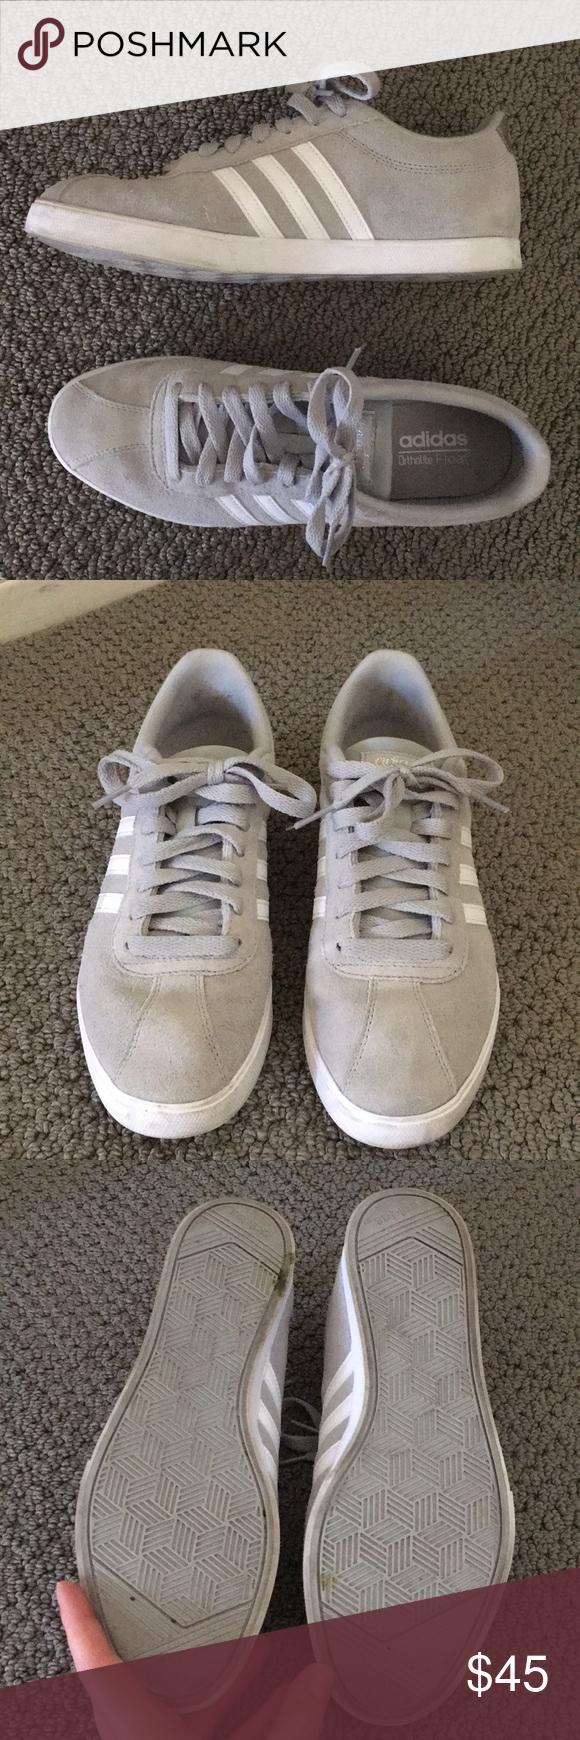 Grey adidas, Shoes sneakers adidas, Adidas